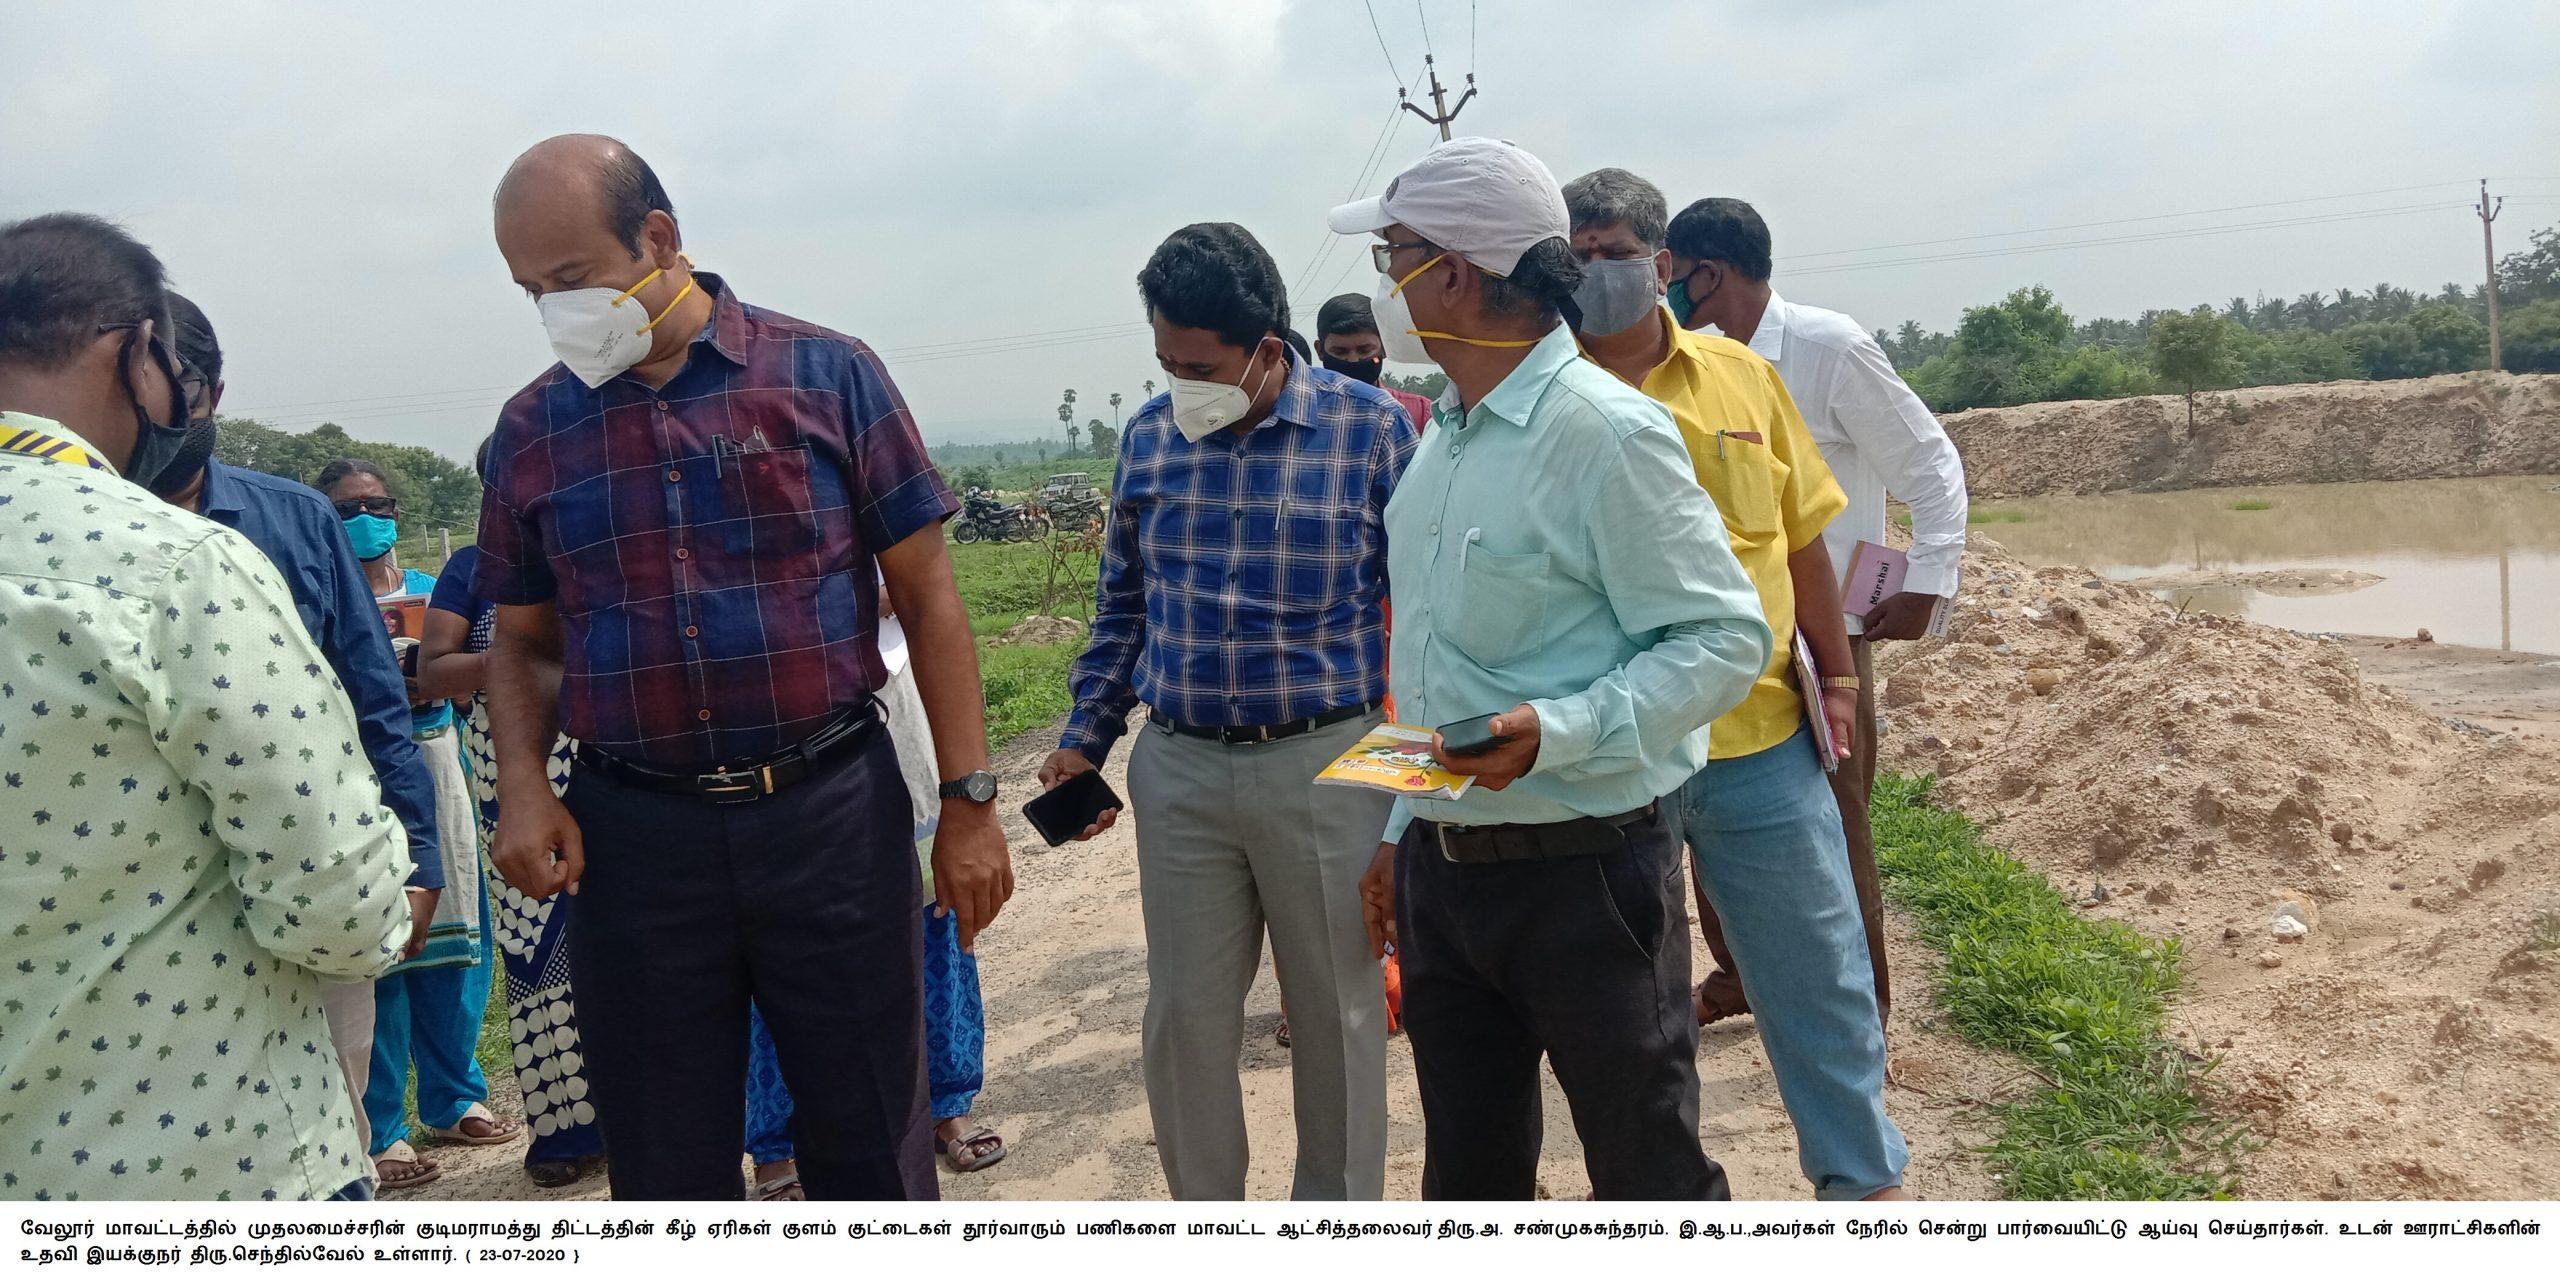 District Collector Inspected Kudimaramathu Works 27-07-2020